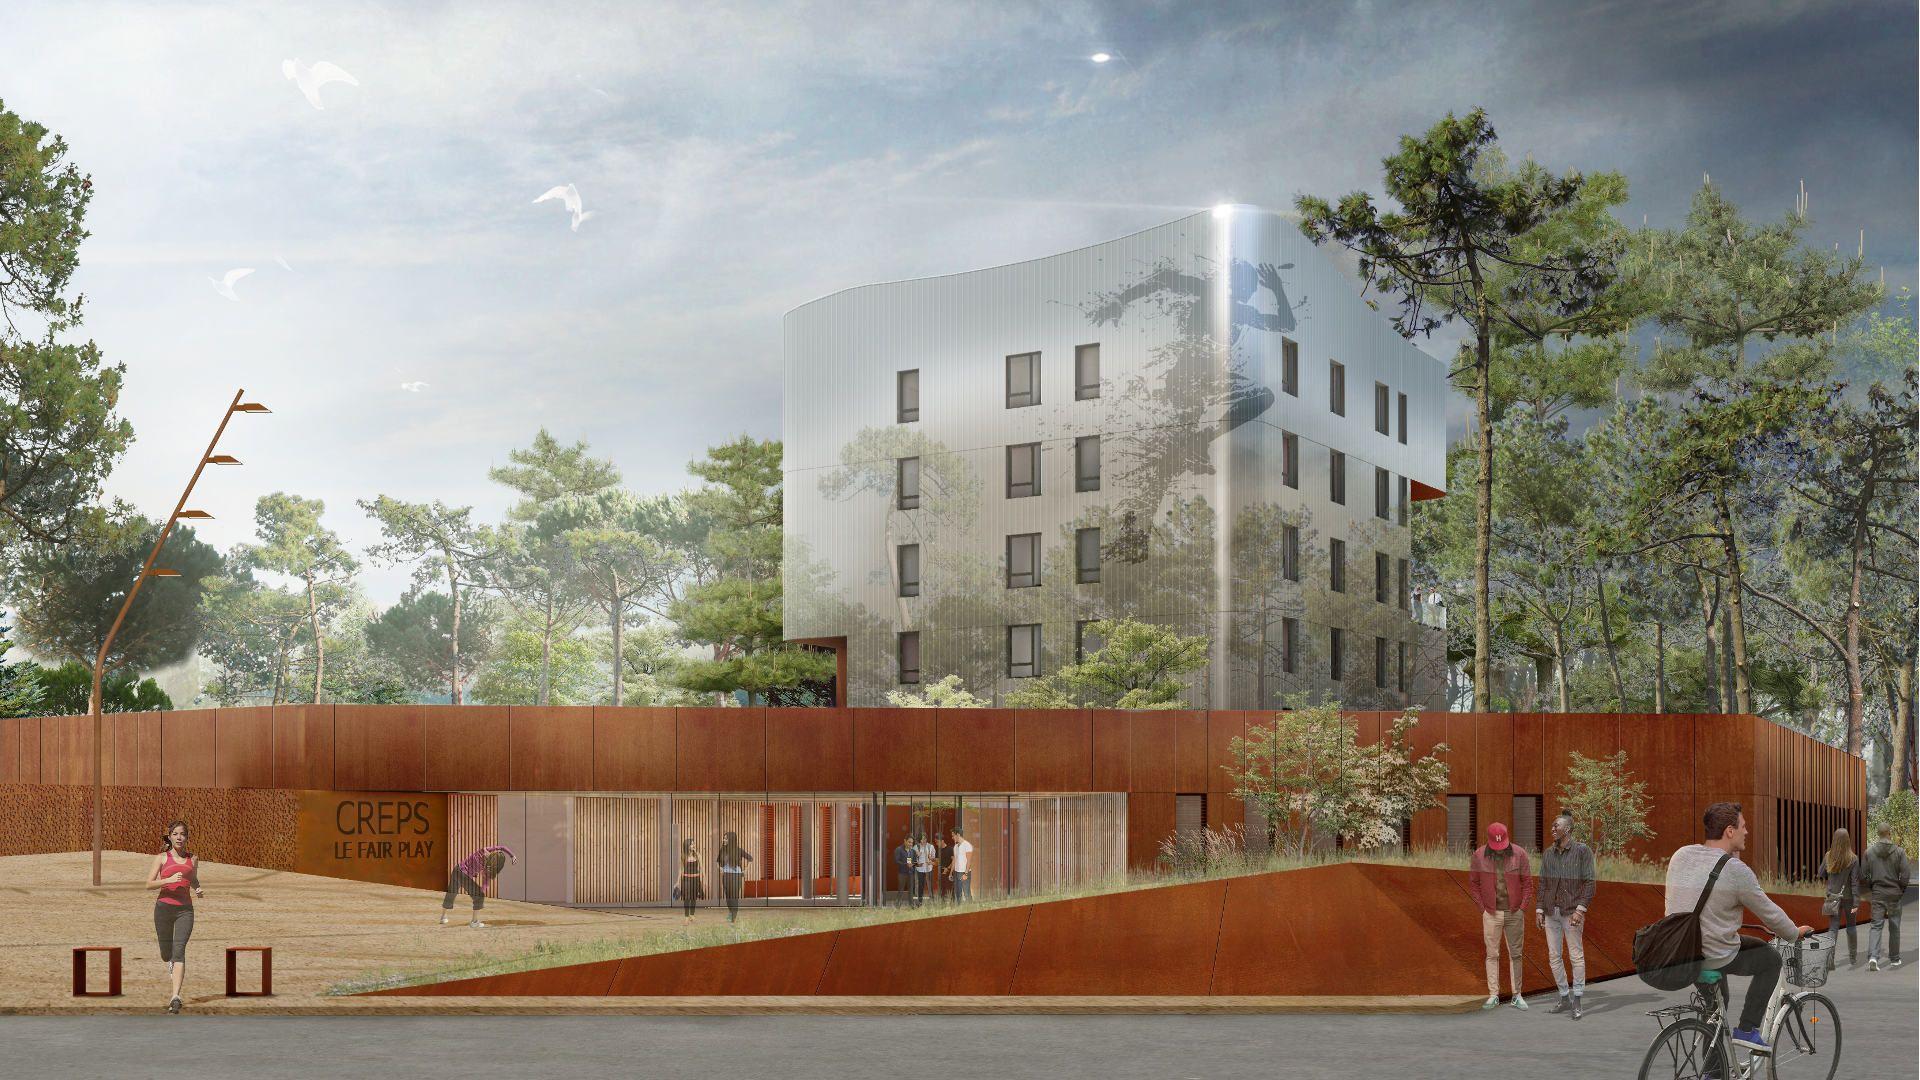 Seuil-architecture-creps-toulouse-residence-hoteliere-slid-2-modifiée.jpeg